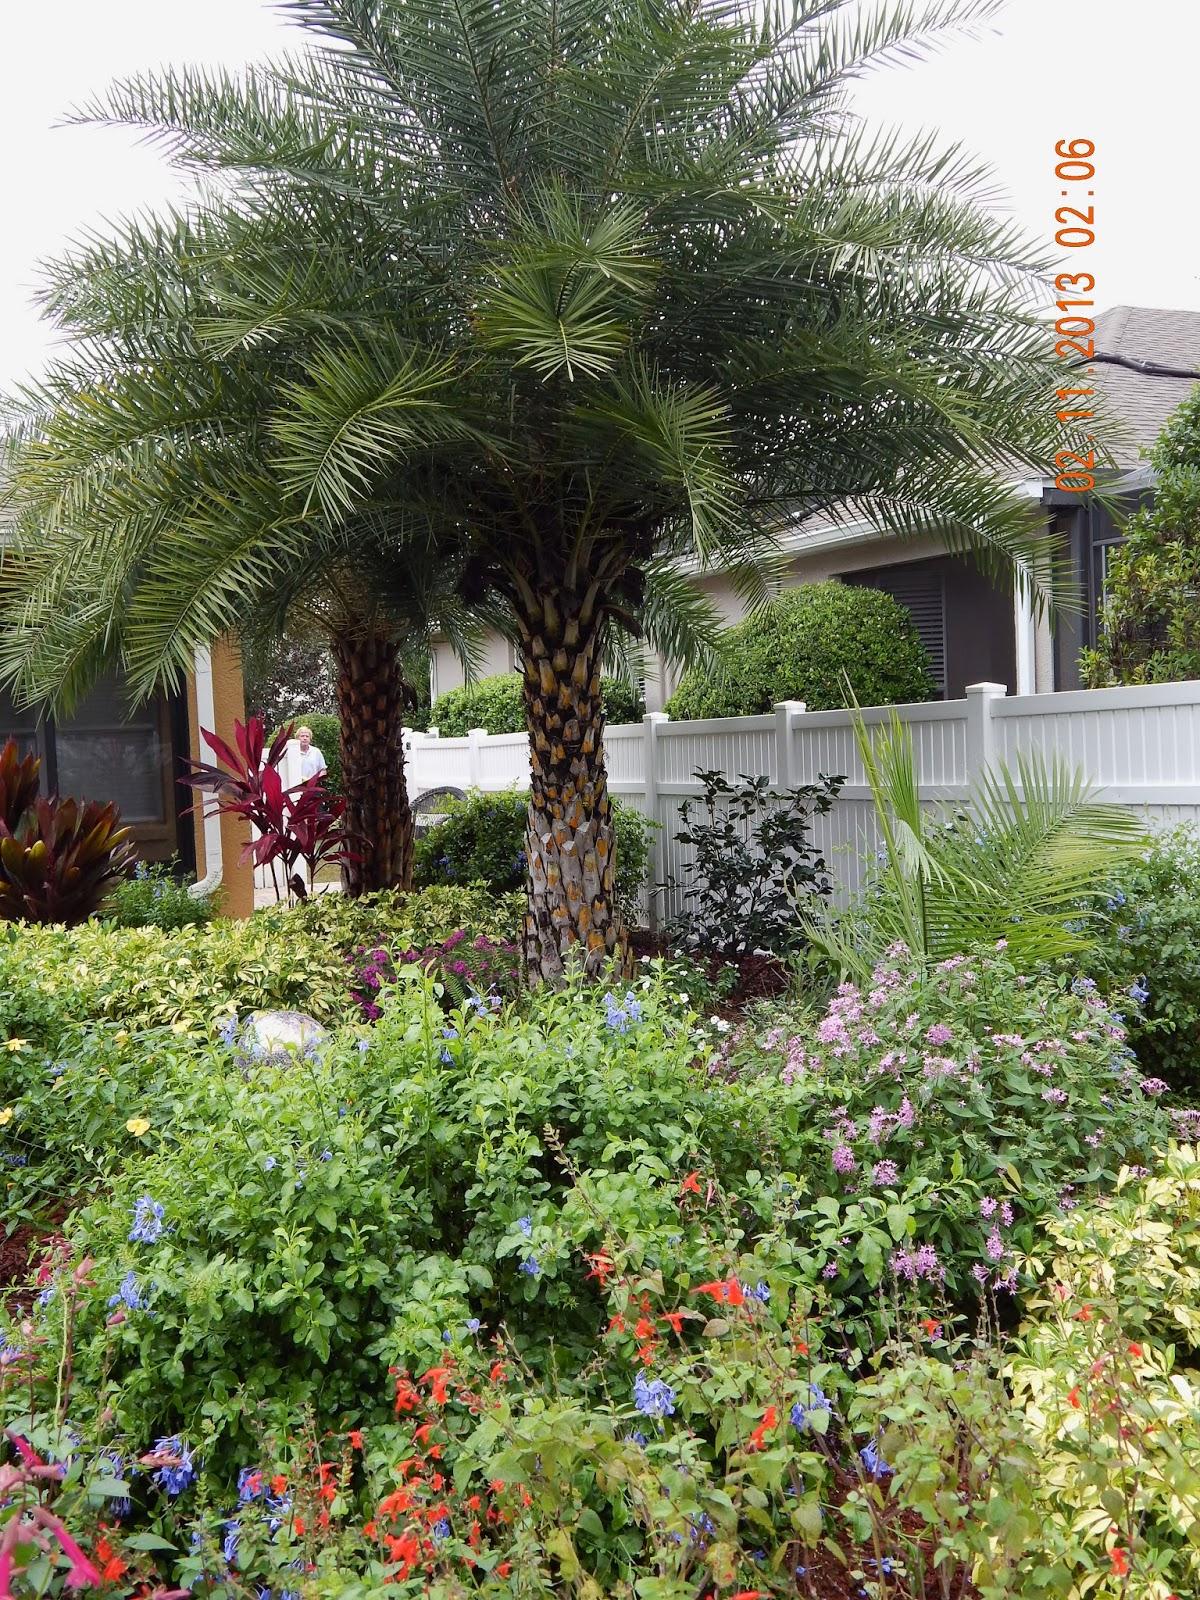 The Gardens of Mount Dora: November 2013